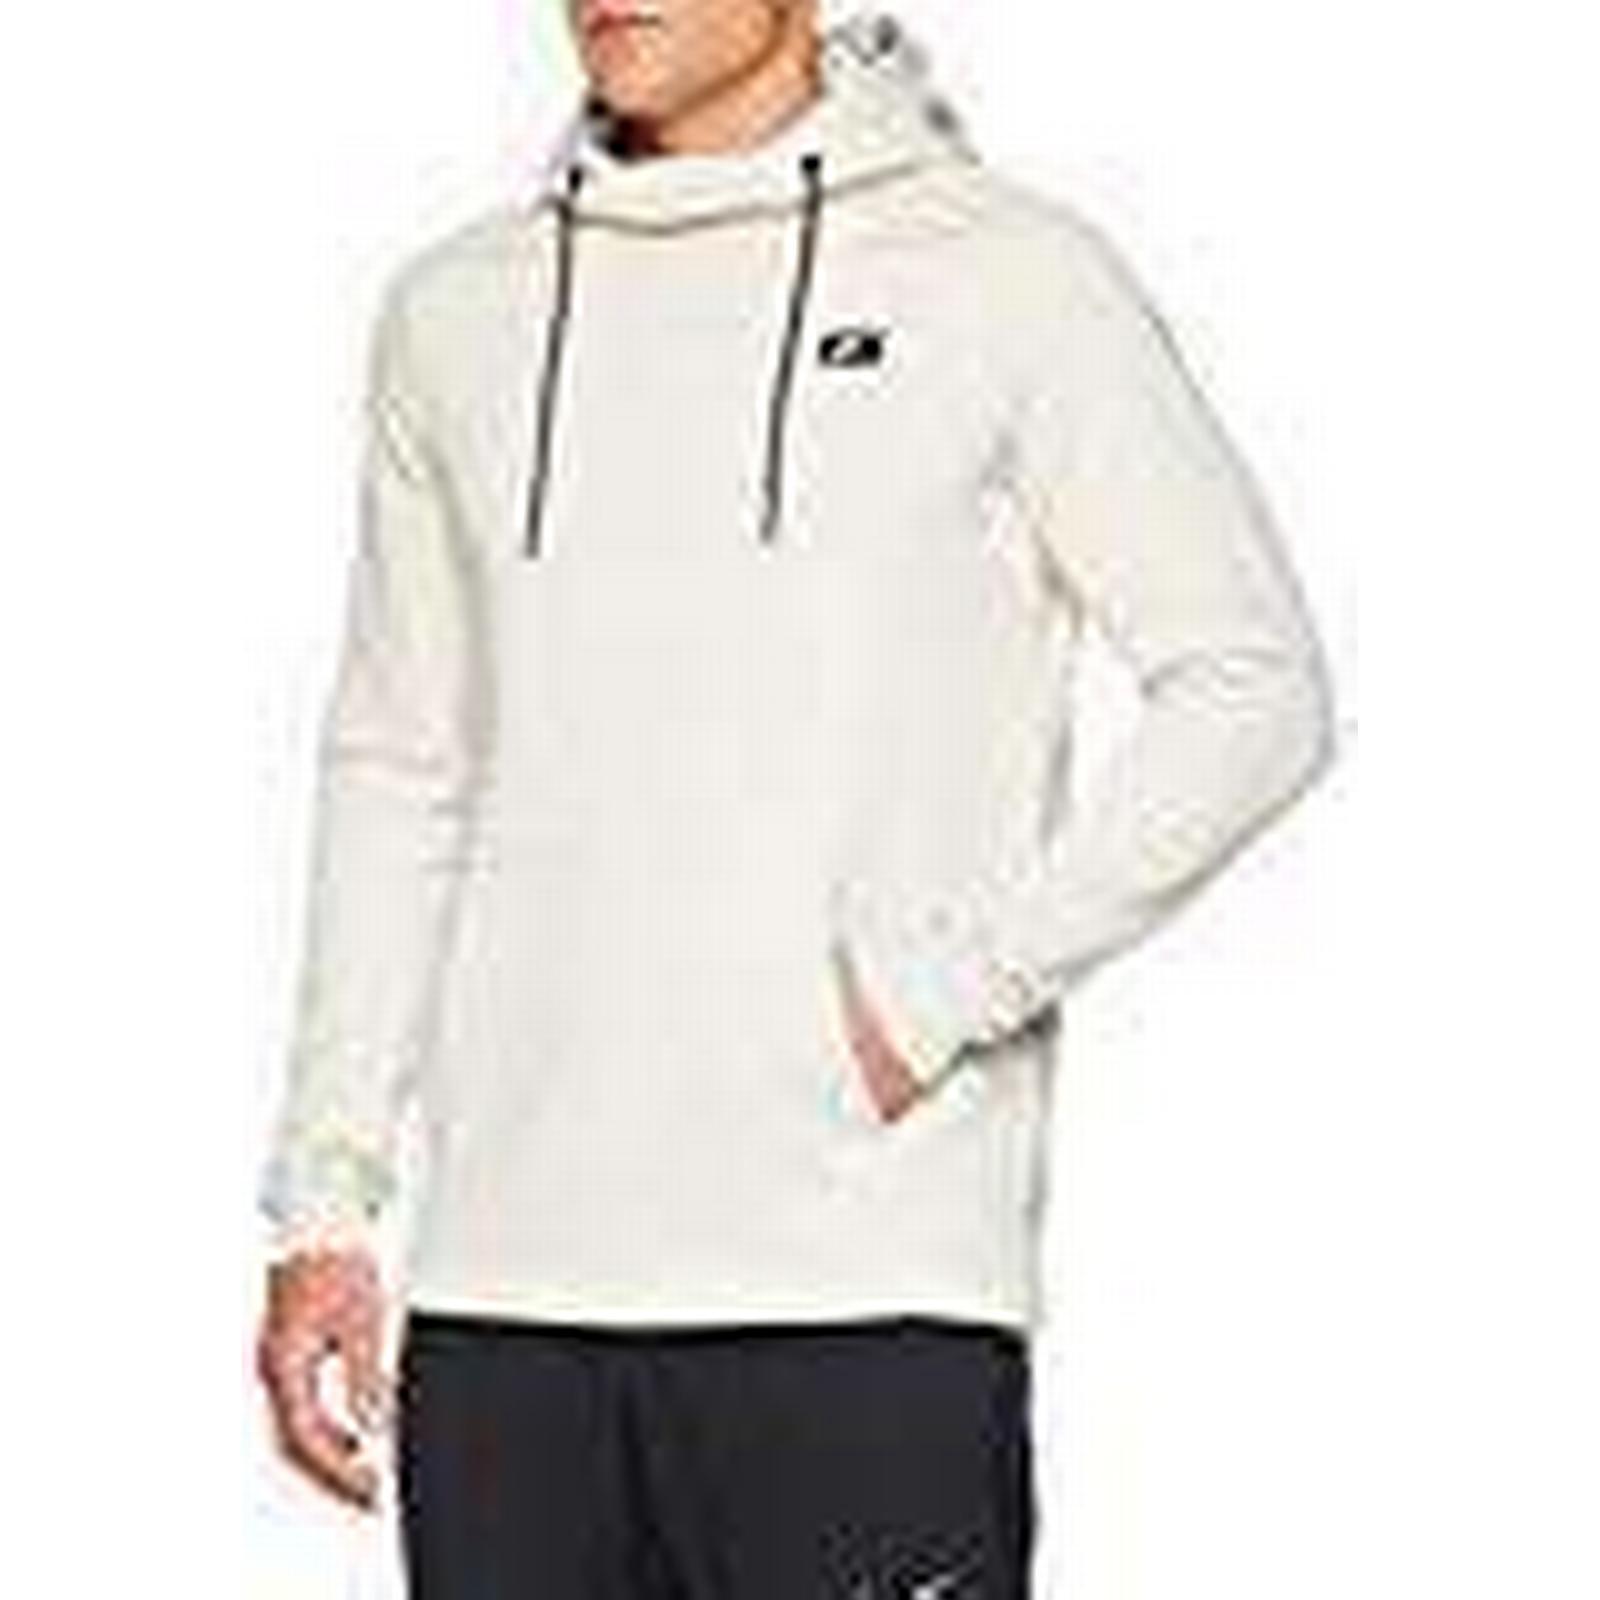 Nike, Pullover, Large Men's, Pullover, Light Bone, Large Pullover, 851418